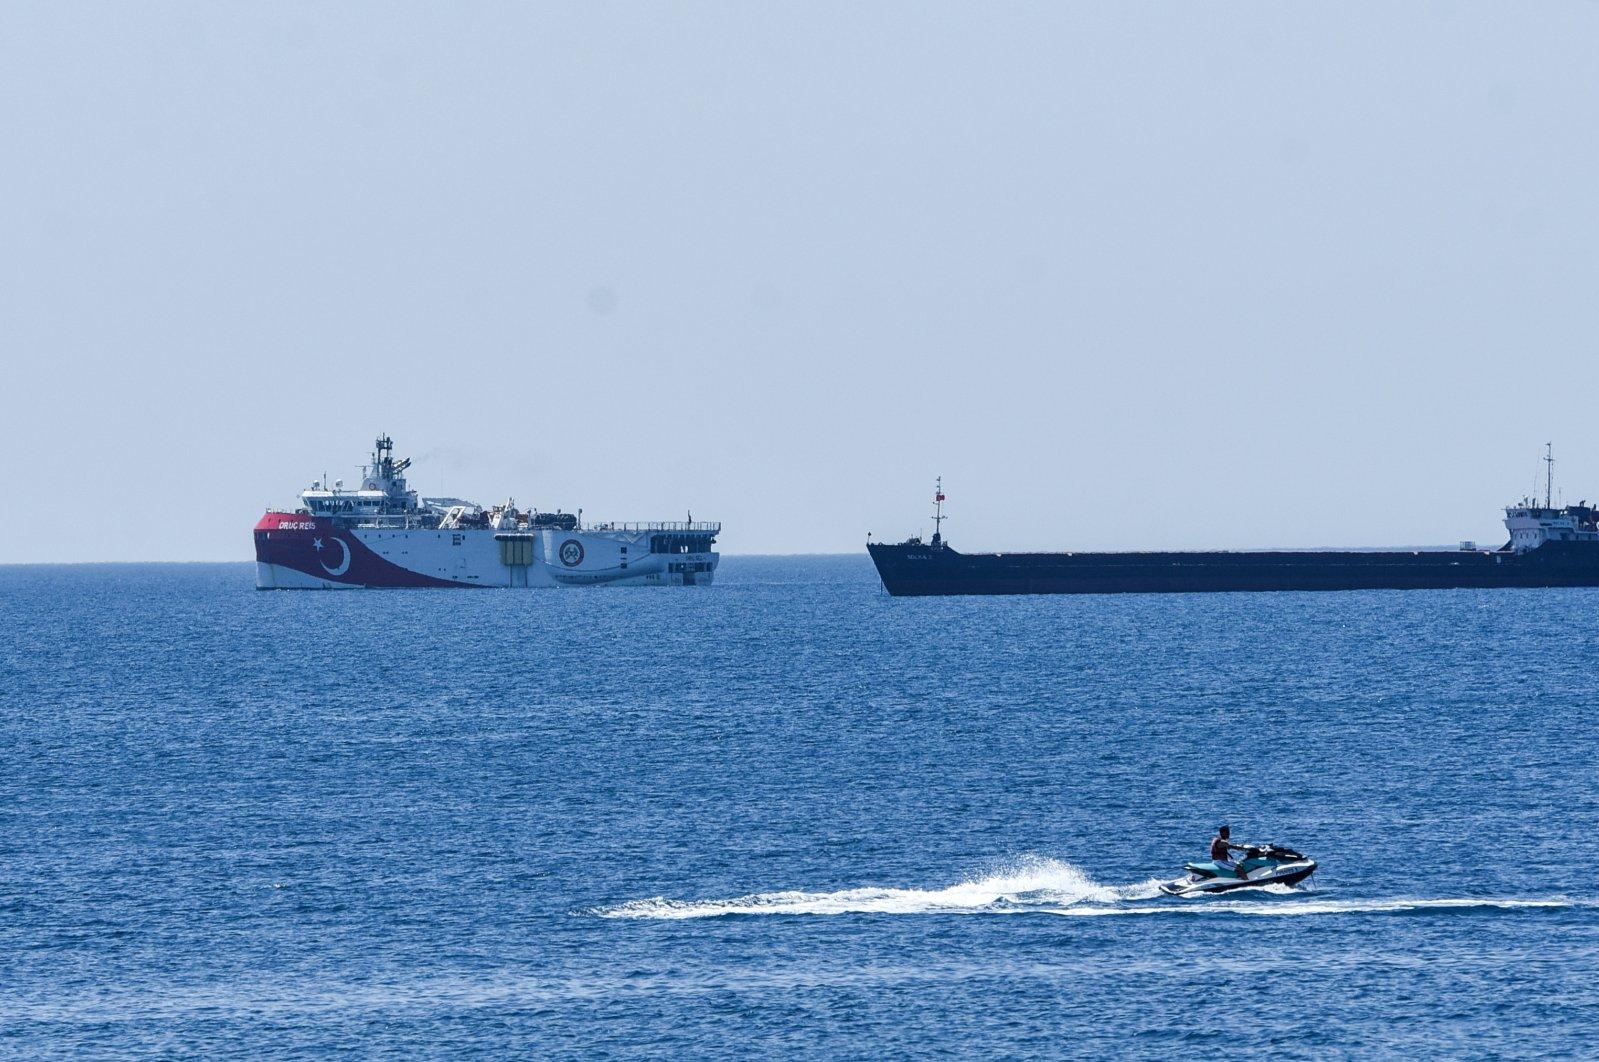 Turkey's seismic research vessel, Oruç Reis, is seen off the southern Turkish coast of Antalya in the Eastern Mediterranean, July 22, 2020. (DHA Photo)